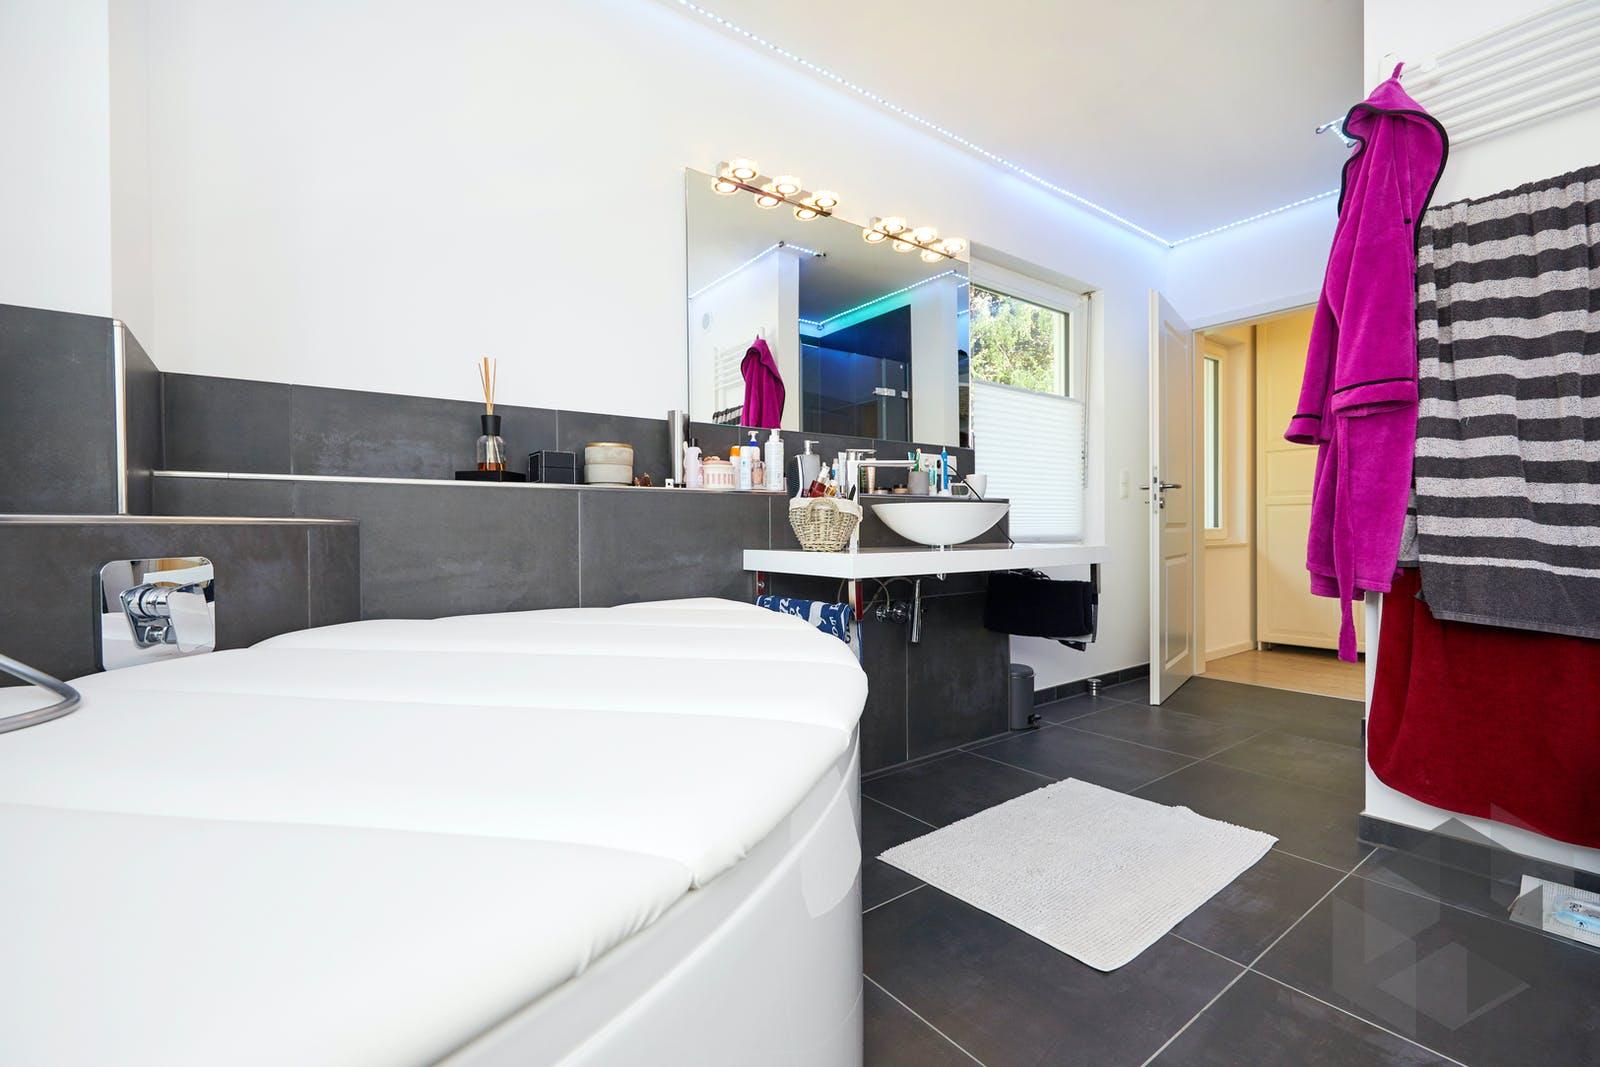 baixa kfw effizienzhaus 40 inactive von gussek haus komplette daten bersicht. Black Bedroom Furniture Sets. Home Design Ideas